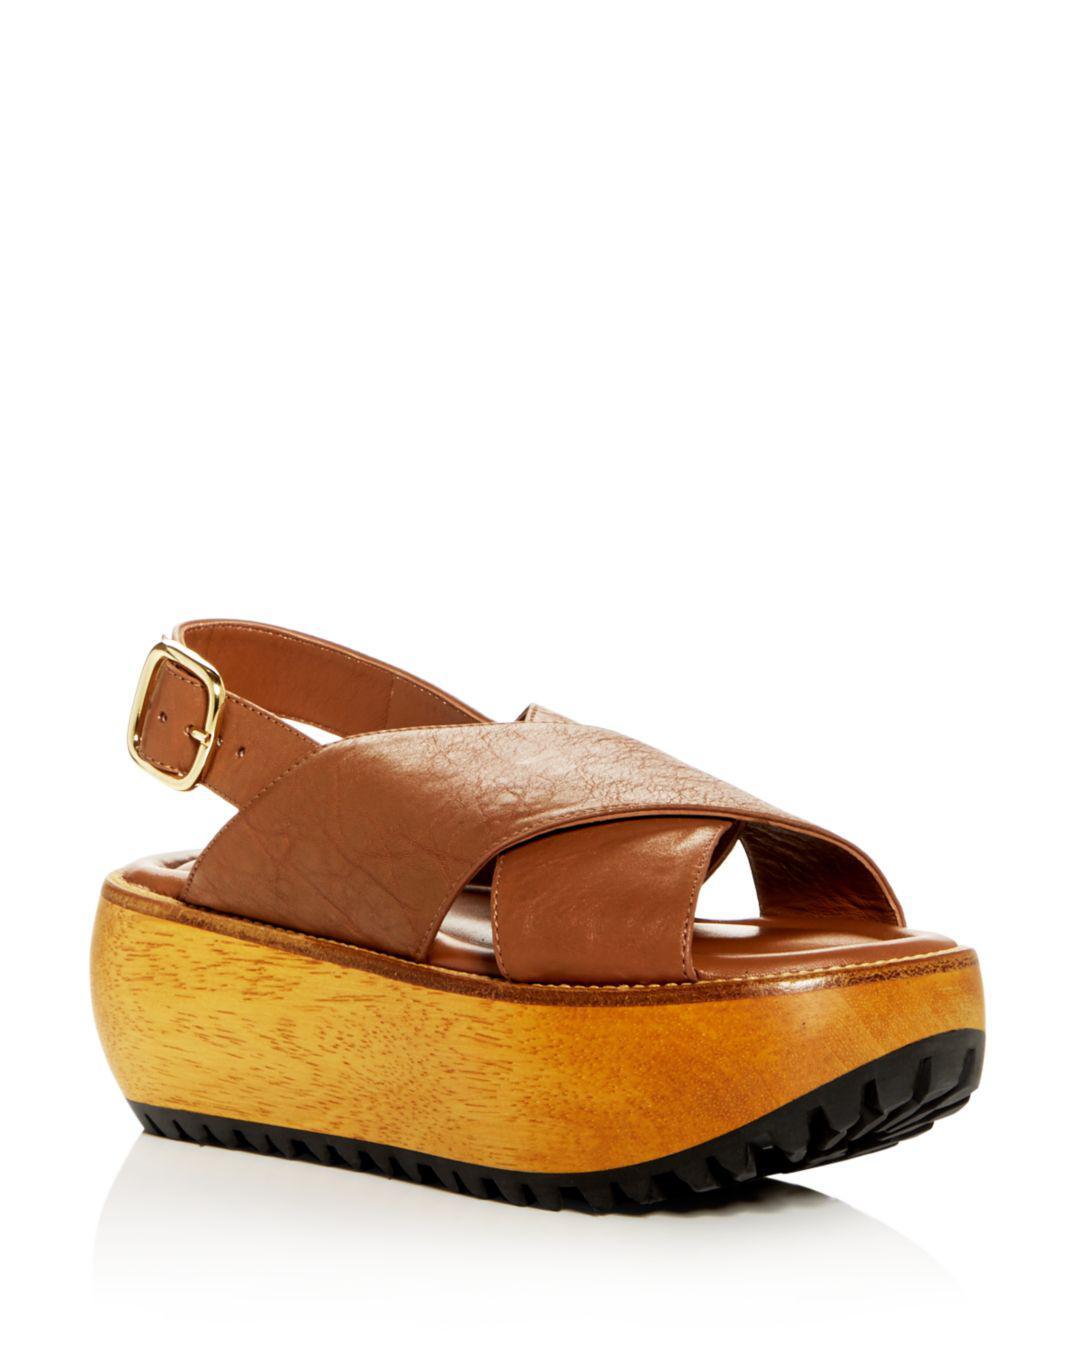 a45d932eb41 Lyst - Marni Women s Leather Crisscross Slingback Platform Sandals ...